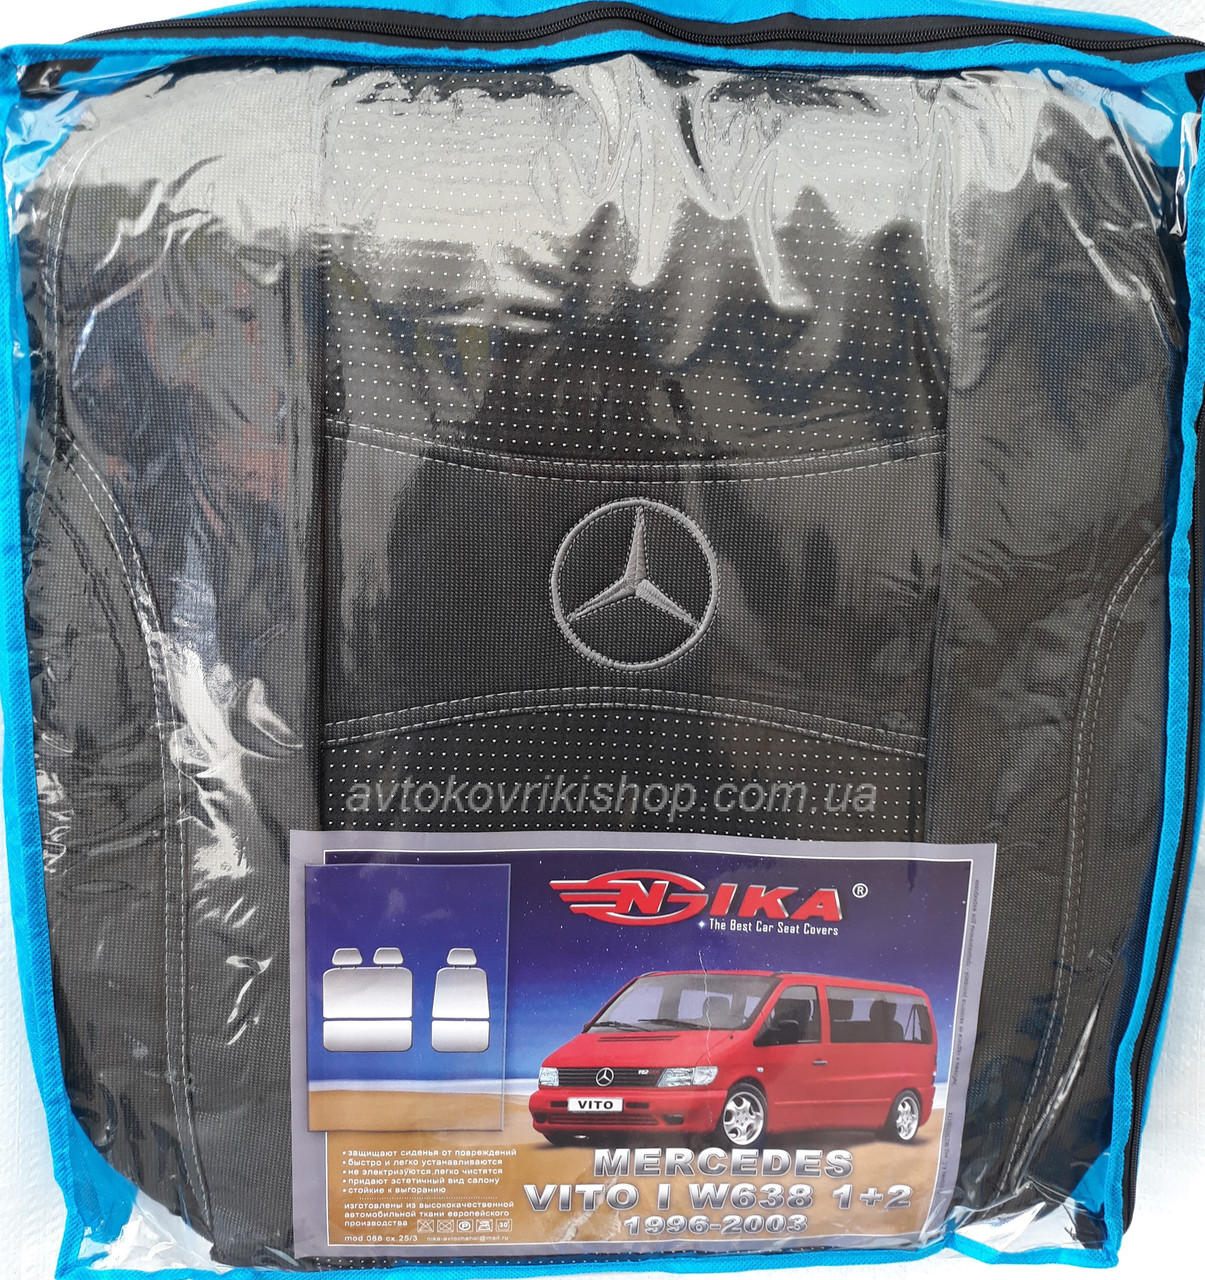 Авточехлы Mercedes-Benz Vito W638 1+2 1996-2003 Nika